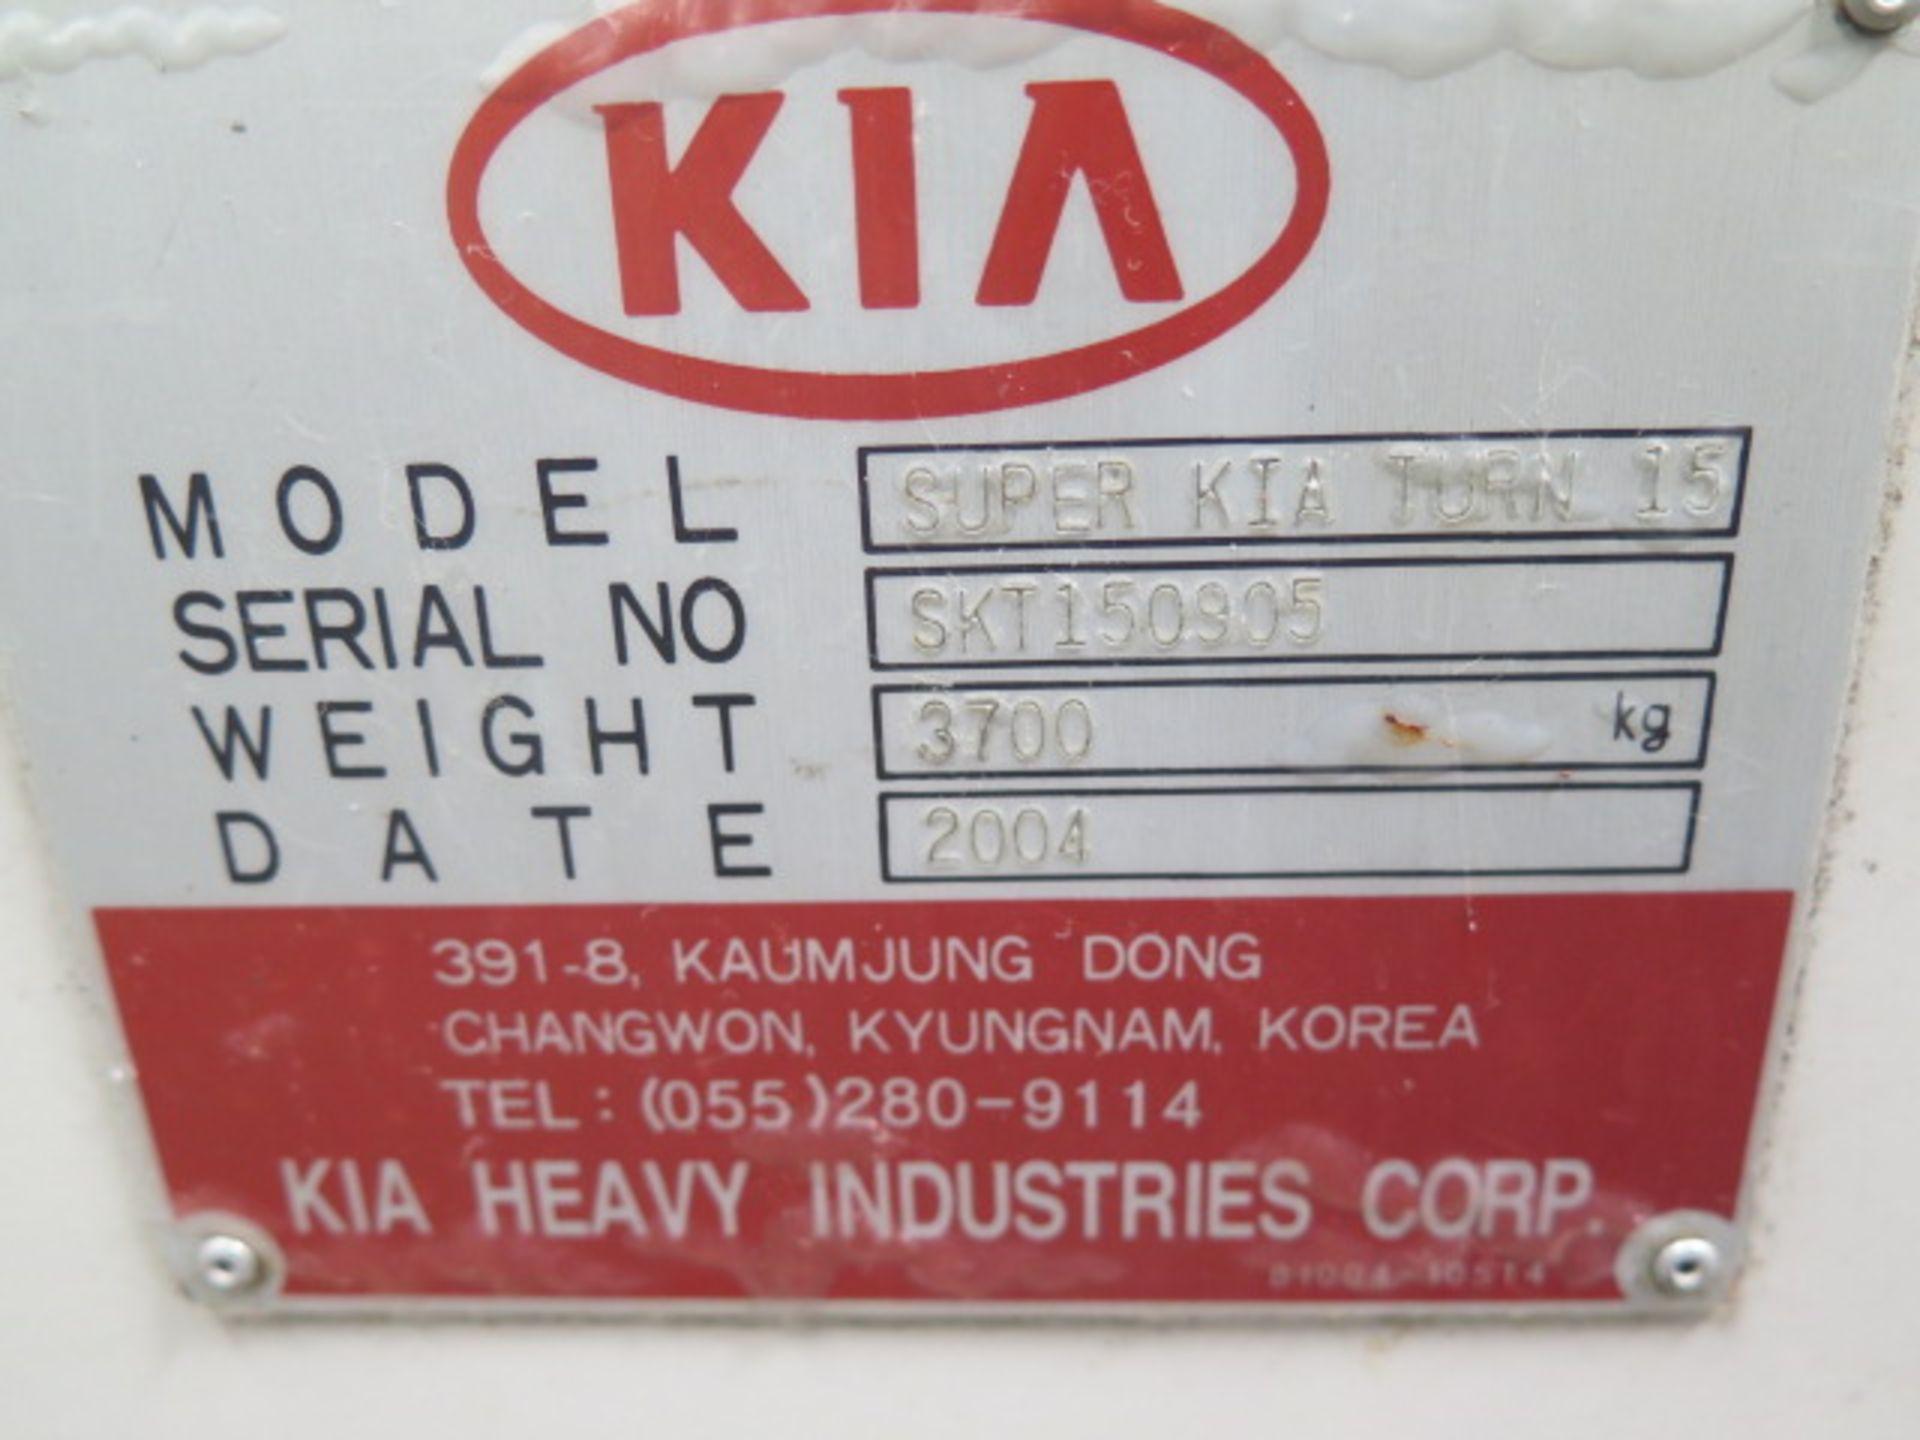 2004 Kia Super KIA Turn 15 CNC Turning Center s/n SKT150905 w/ Fanuc Series 0i-TB Contrs, SOLD AS IS - Image 16 of 16